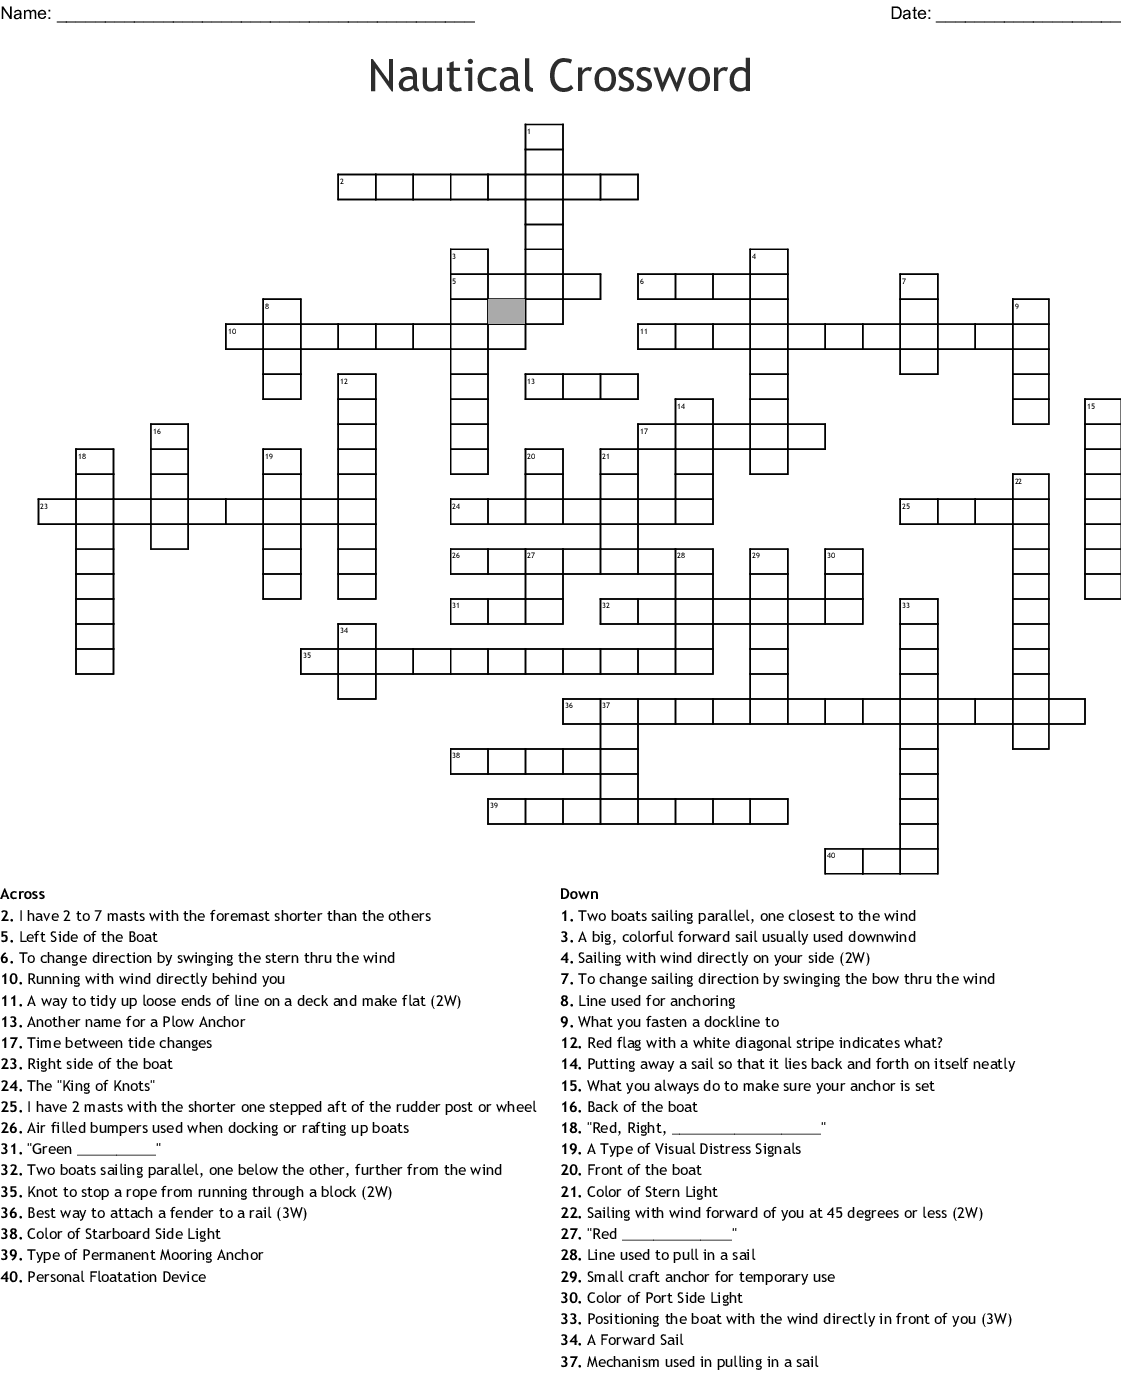 Nautical Crossword